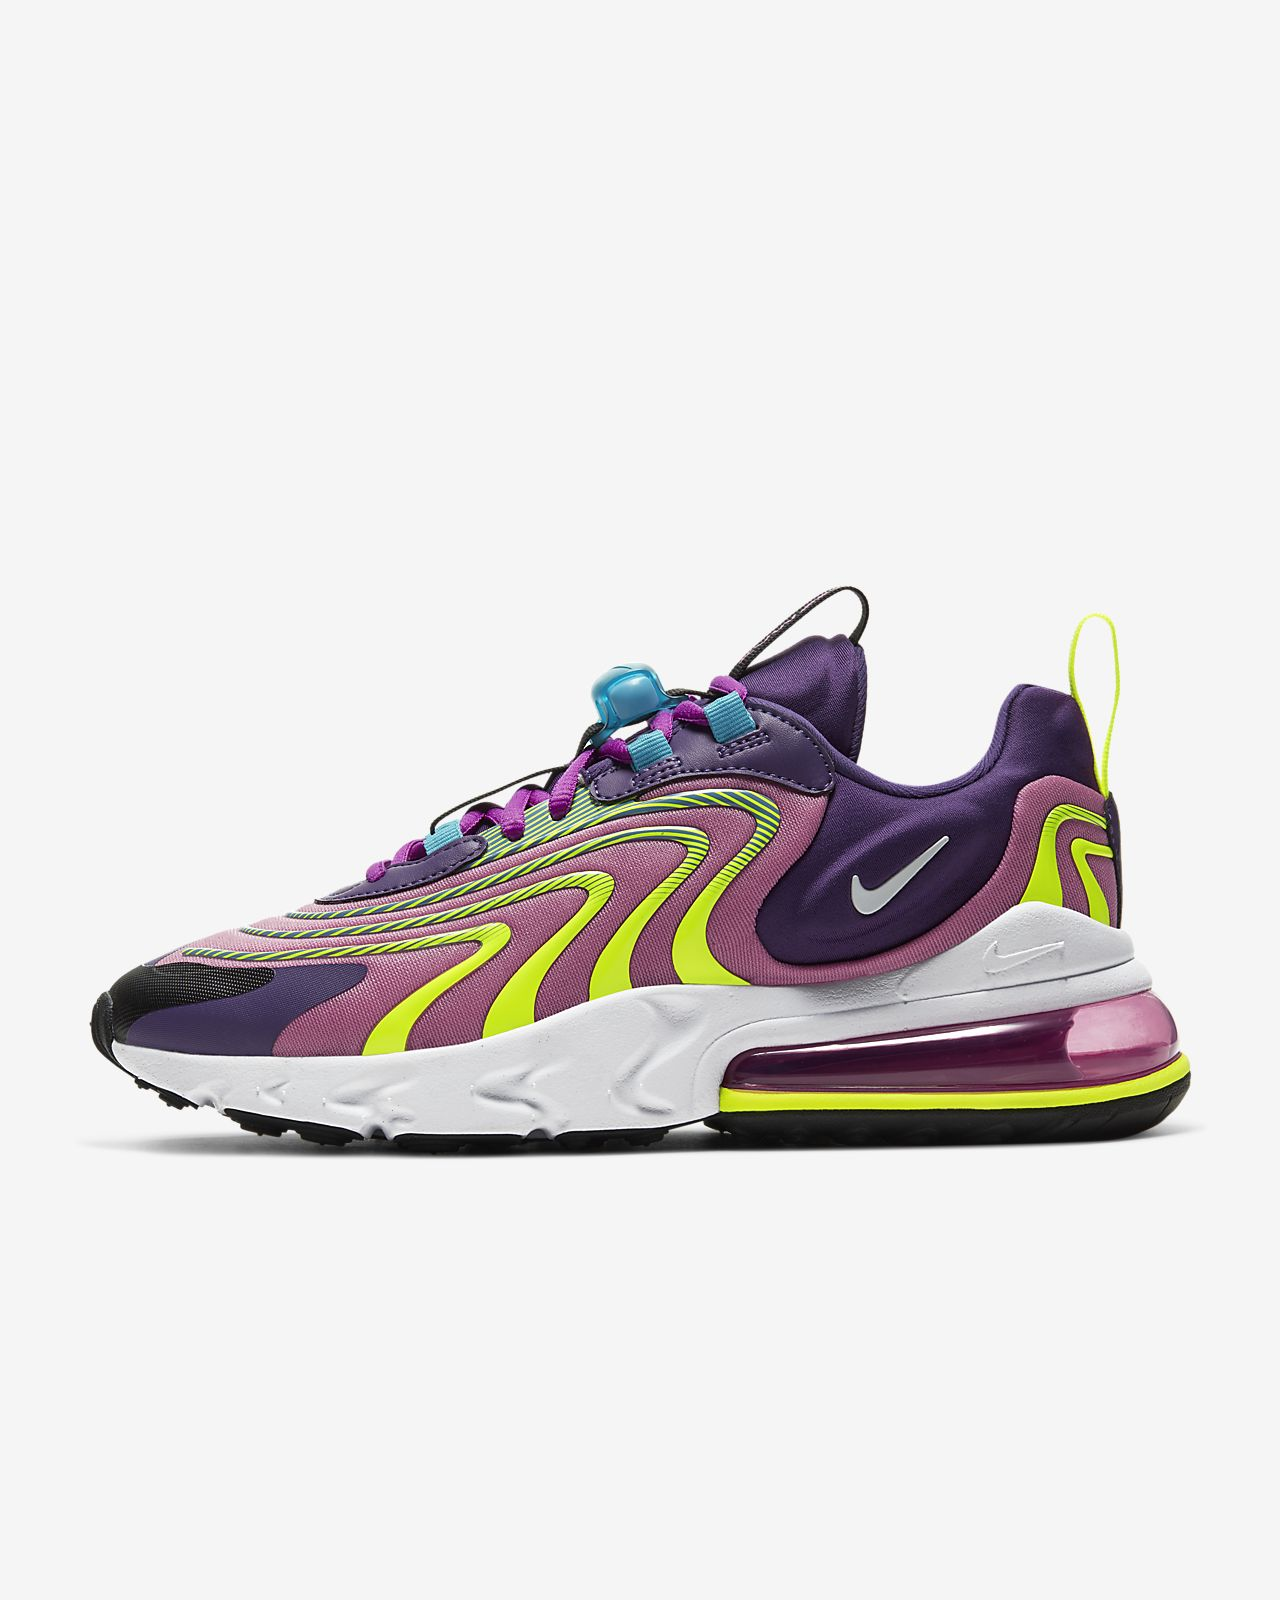 Nike Air Max 270 React ENG sko til kvinder